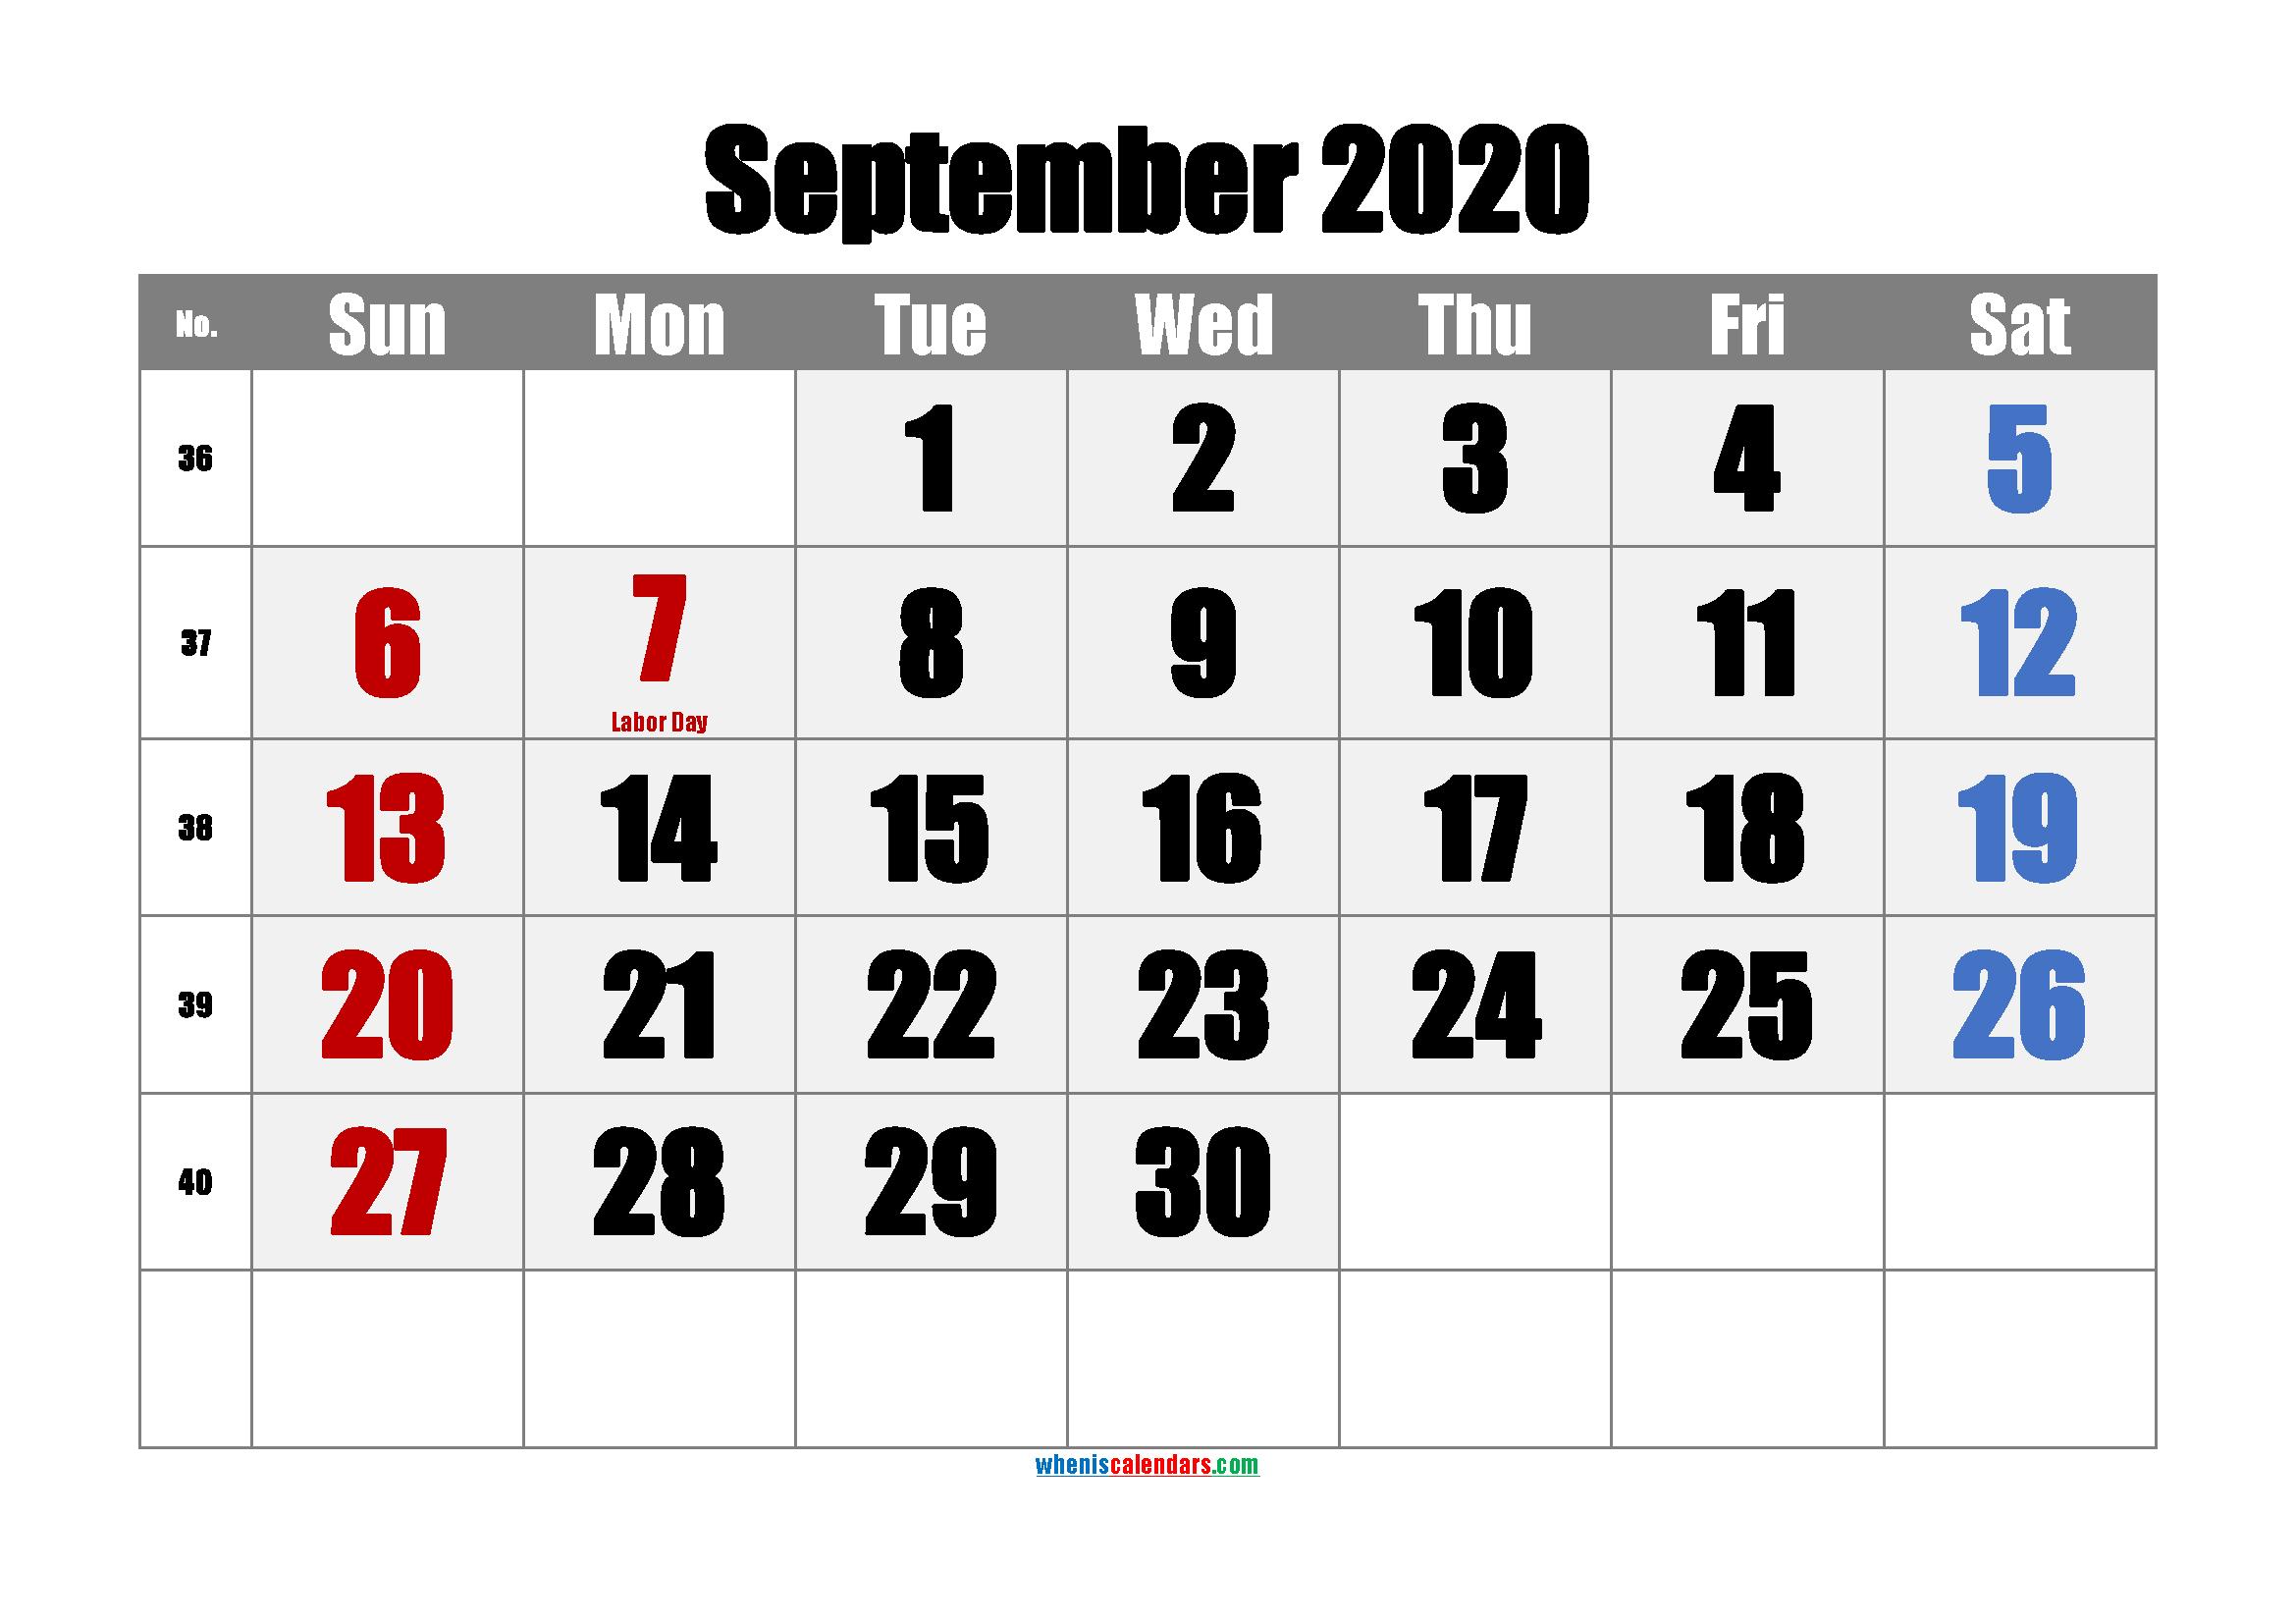 SEPTEMBER 2020 Printable Calendar with Holidays